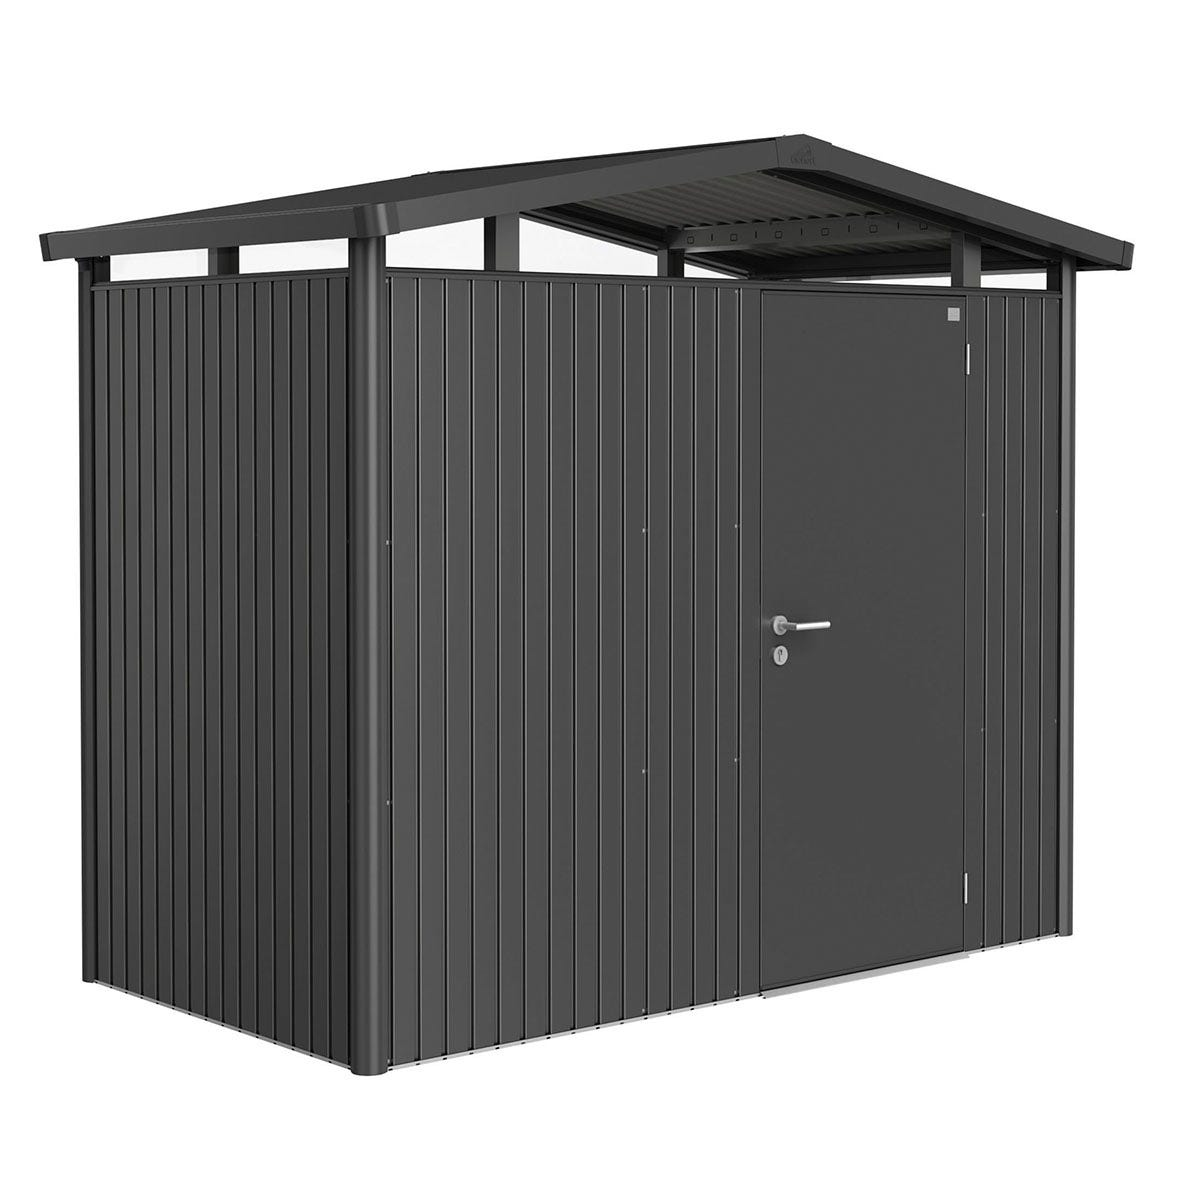 Biohort Panorama Metal Shed P1 Standard Door 9' x 5' - Dark Grey